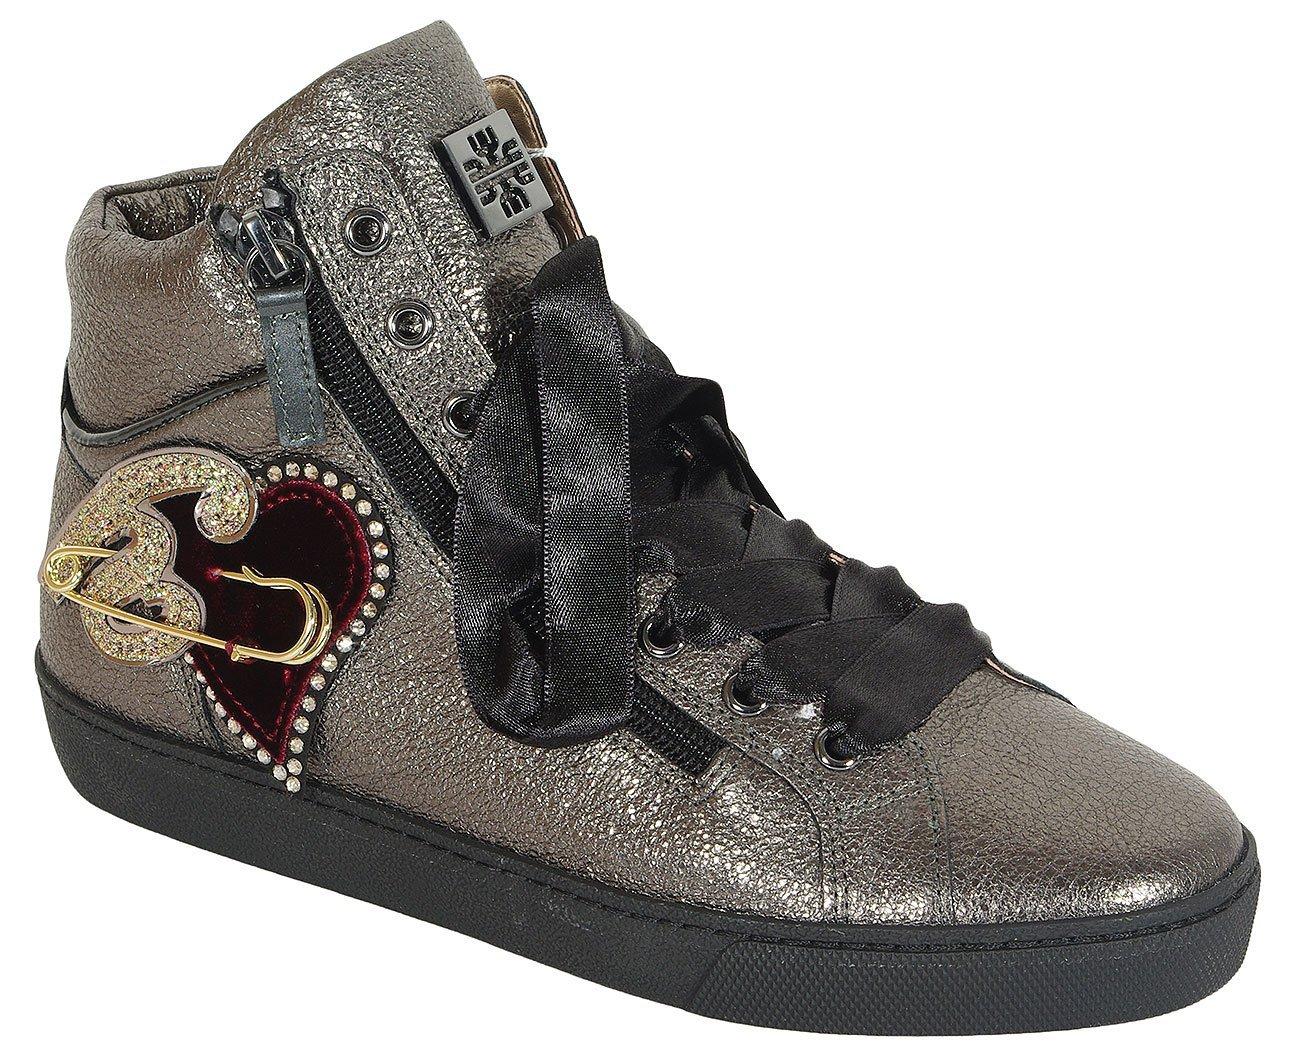 Hogl 0361 sneakers crackskin antracit